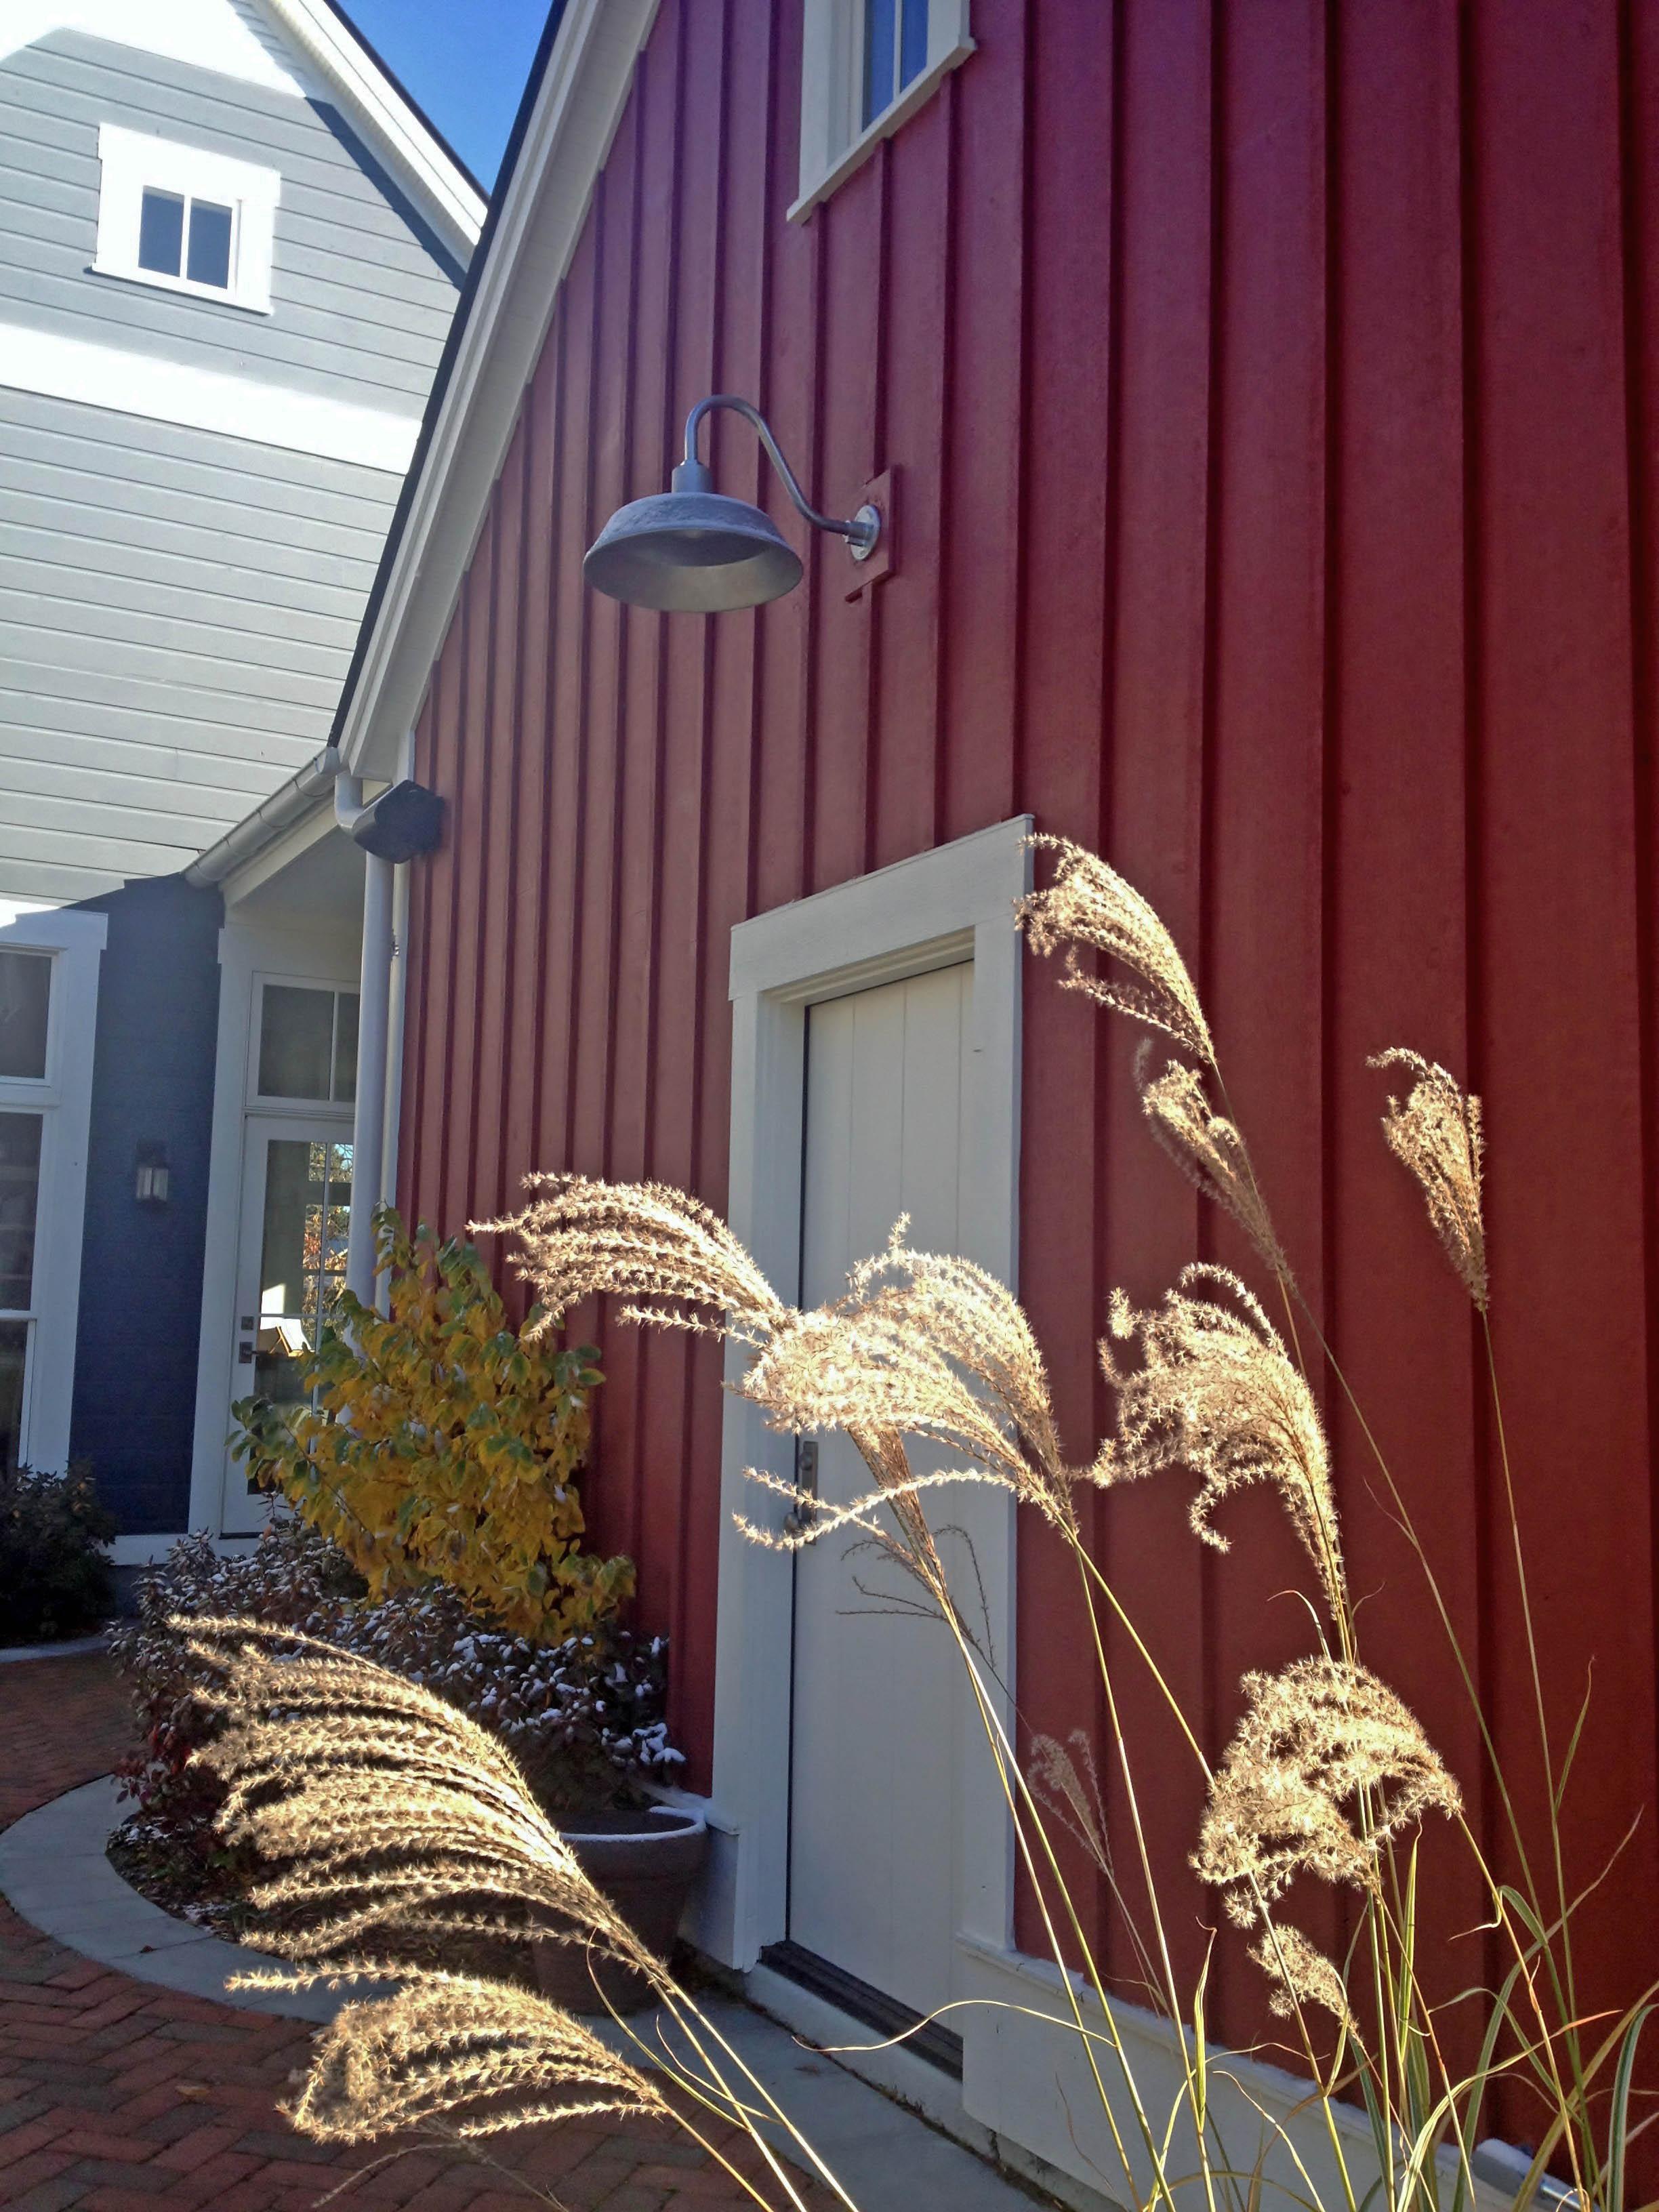 Original Barn Lighting lights up a modern farm home.